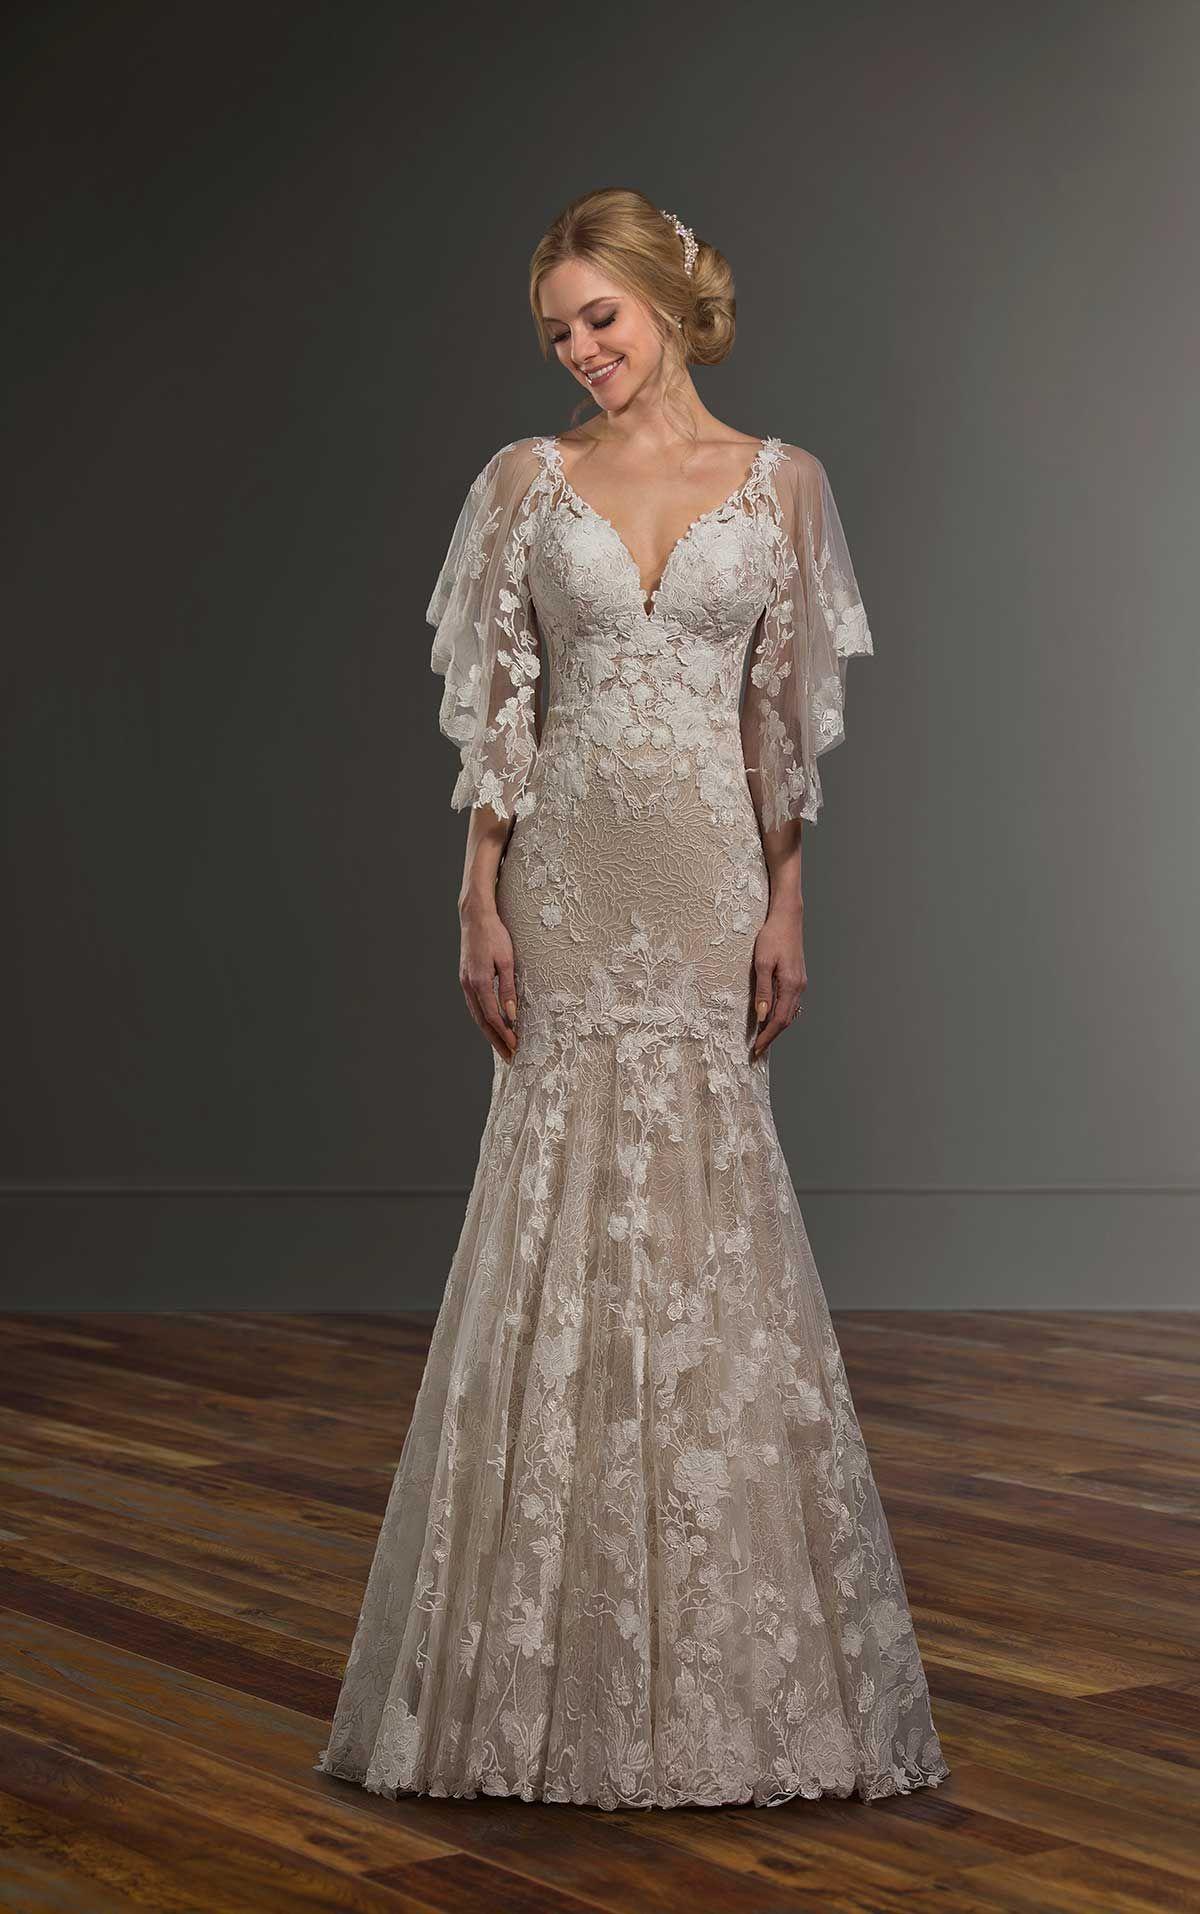 Boho Wedding Dress with Detachable Flutter Sleeves